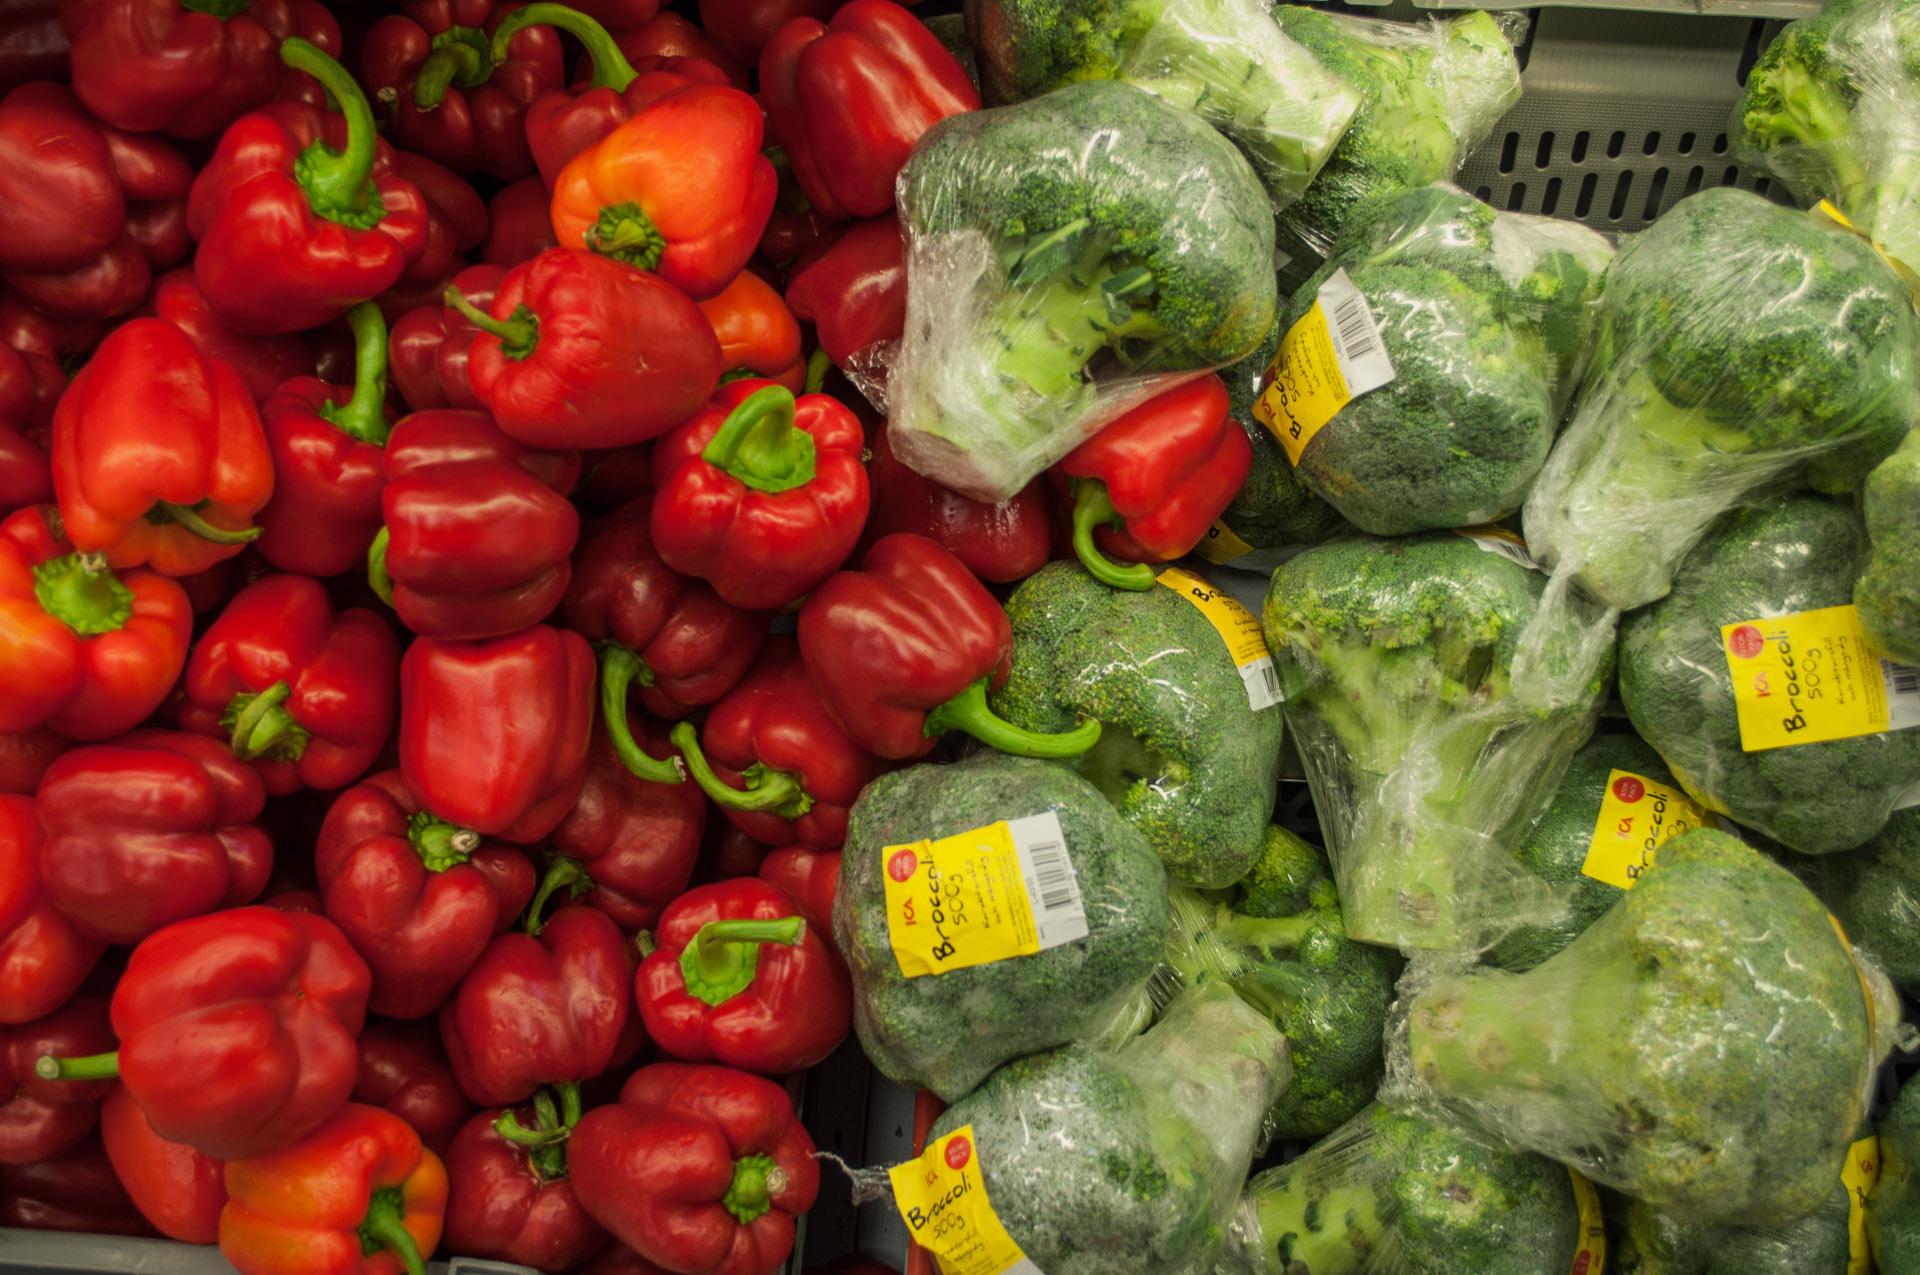 Paprica and brocoli